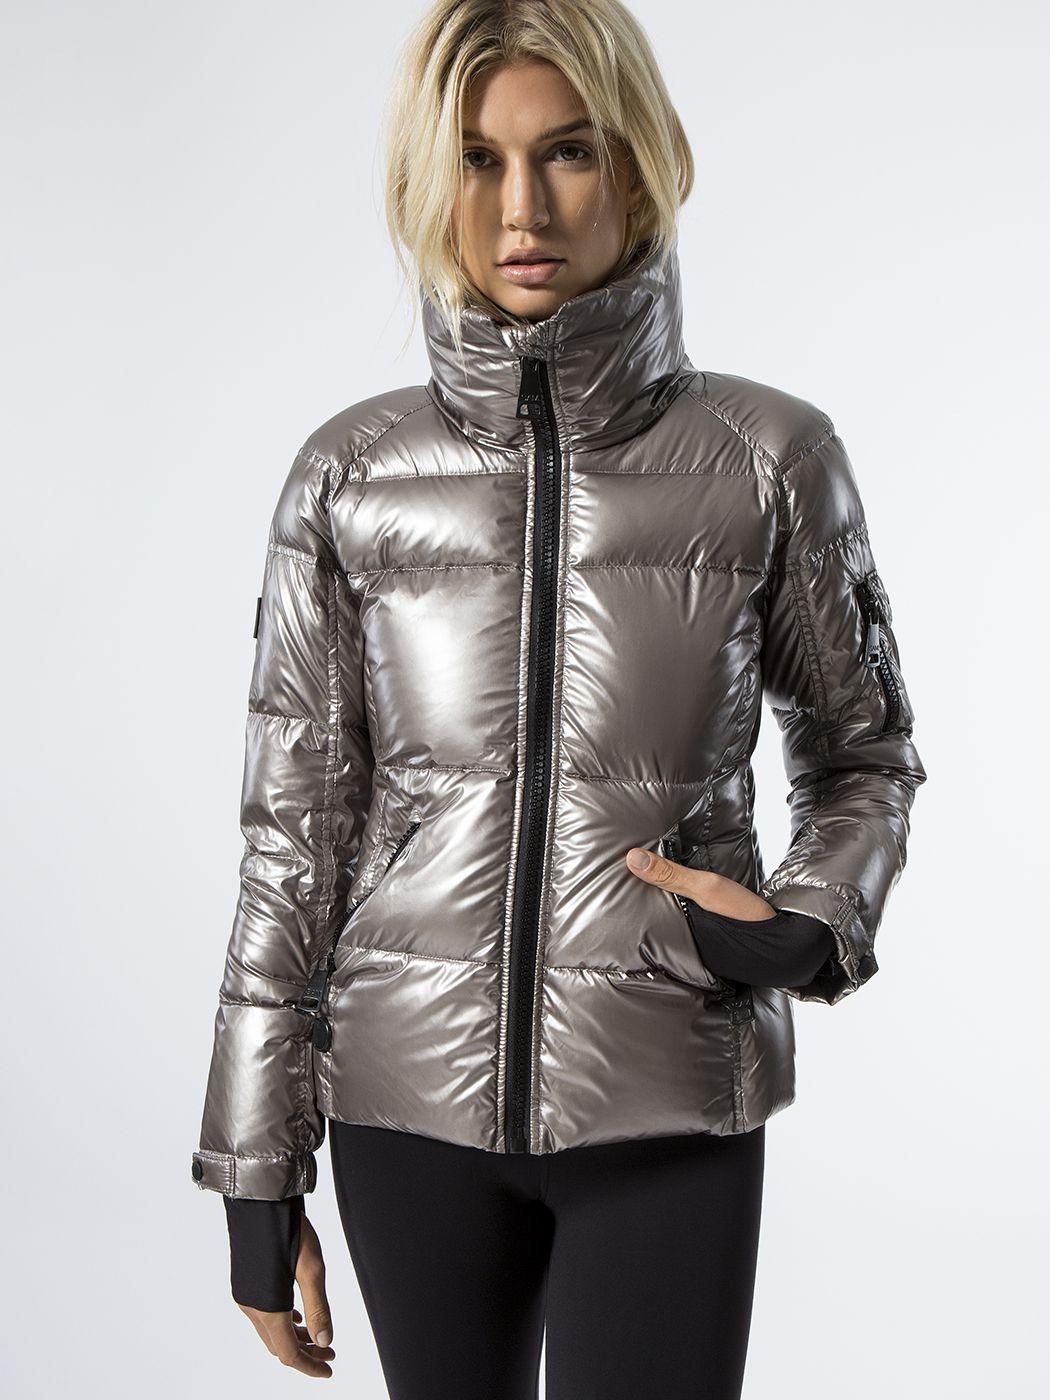 Freestyle Jacket In Gunmetal By Sam From Carbon38 Elegant Jacket Jackets Outerwear Women [ 1400 x 1050 Pixel ]